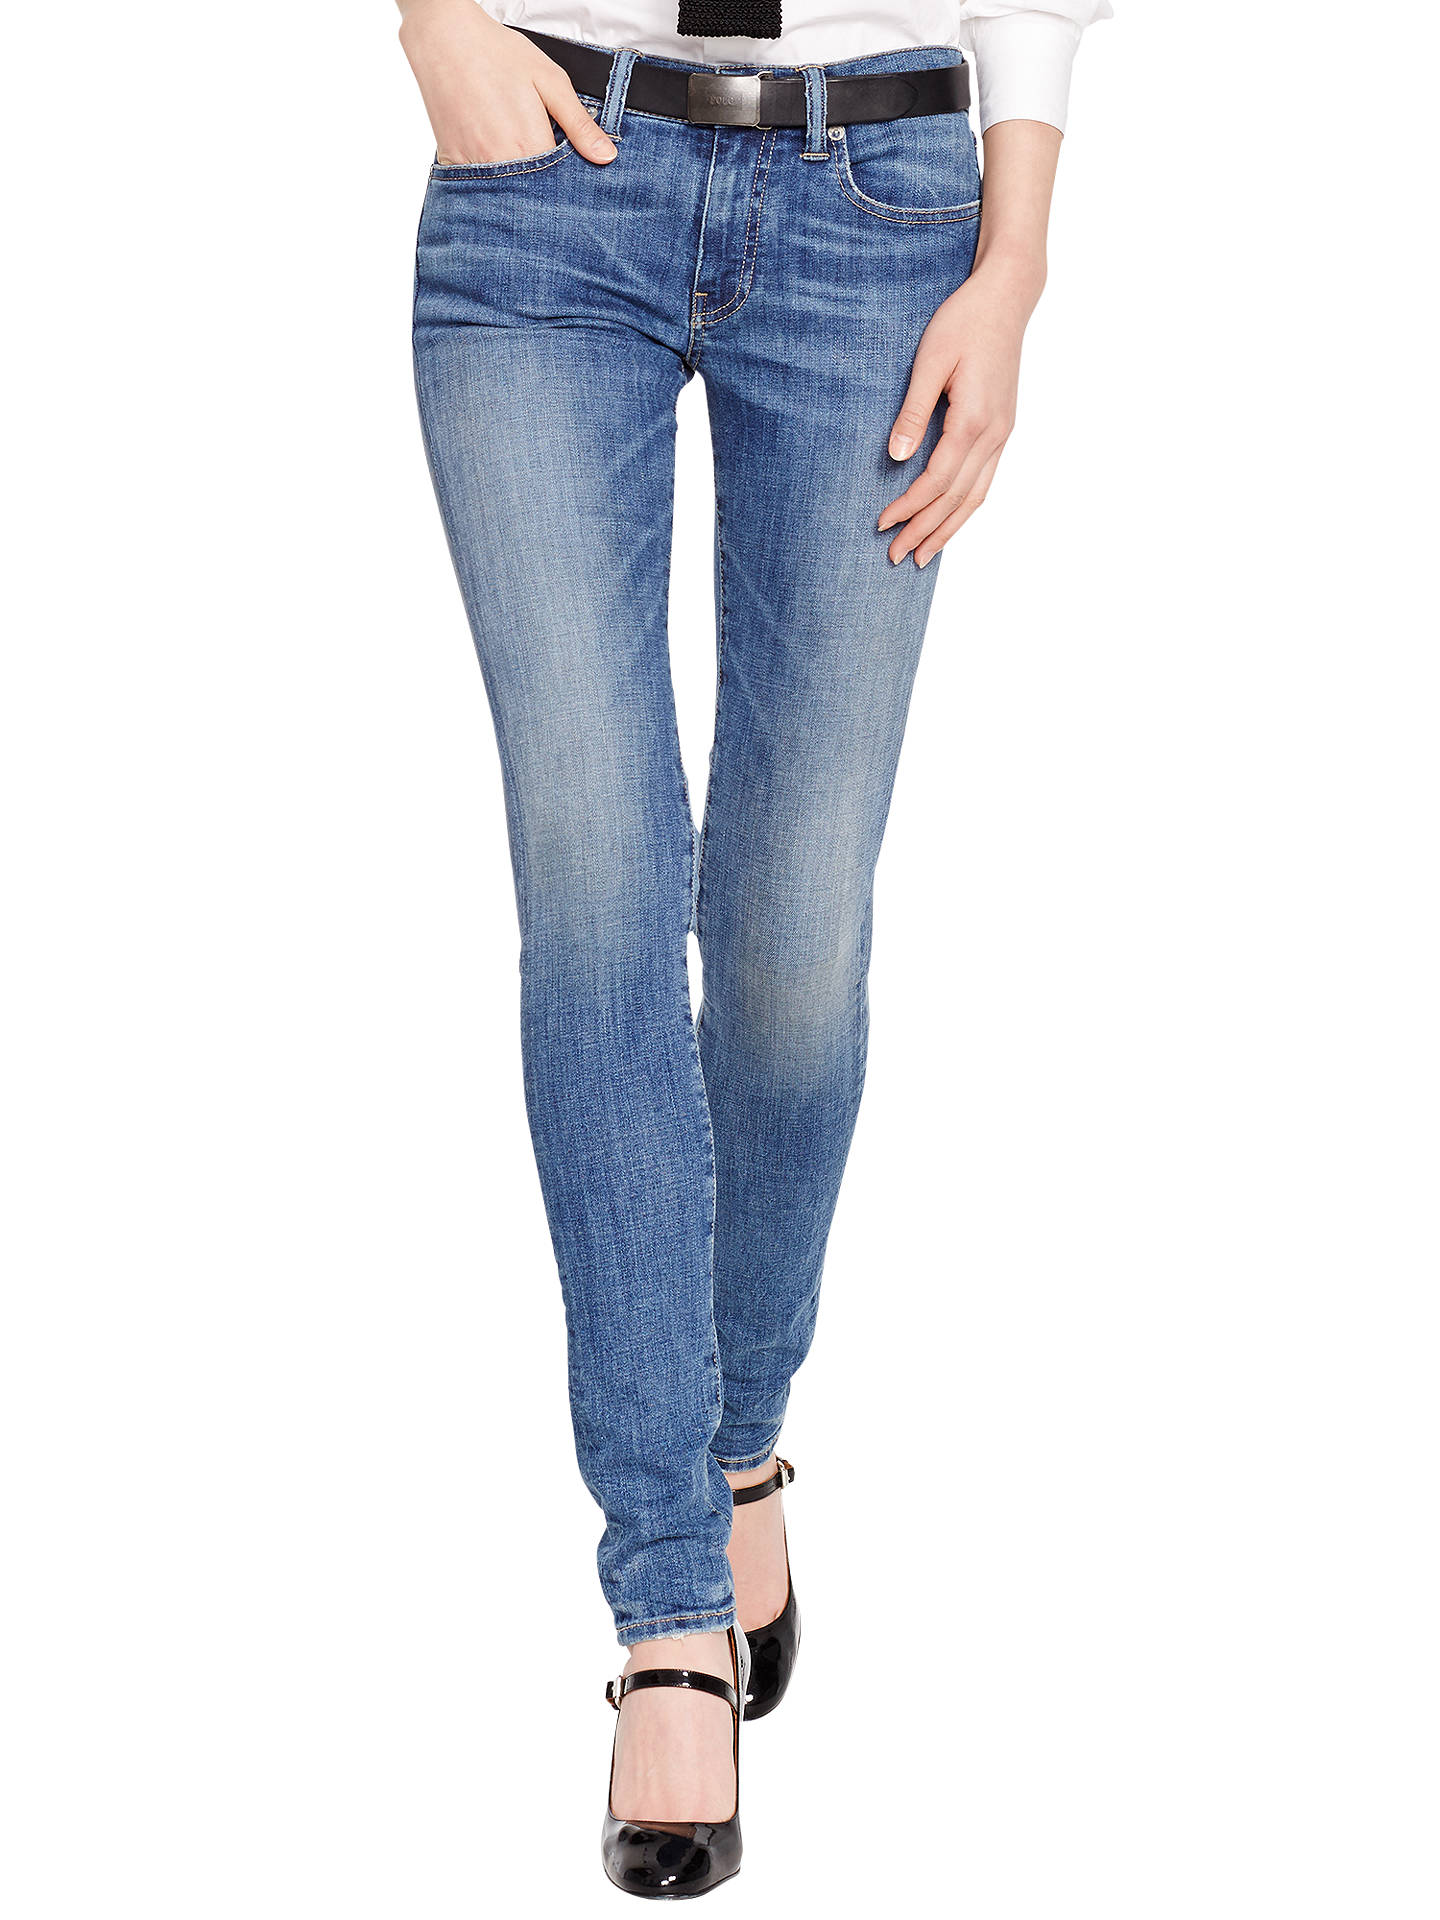 ed49b5797e Polo Ralph Lauren Tompkins Skinny Fit Jeans, Calloway Indigo at John ...